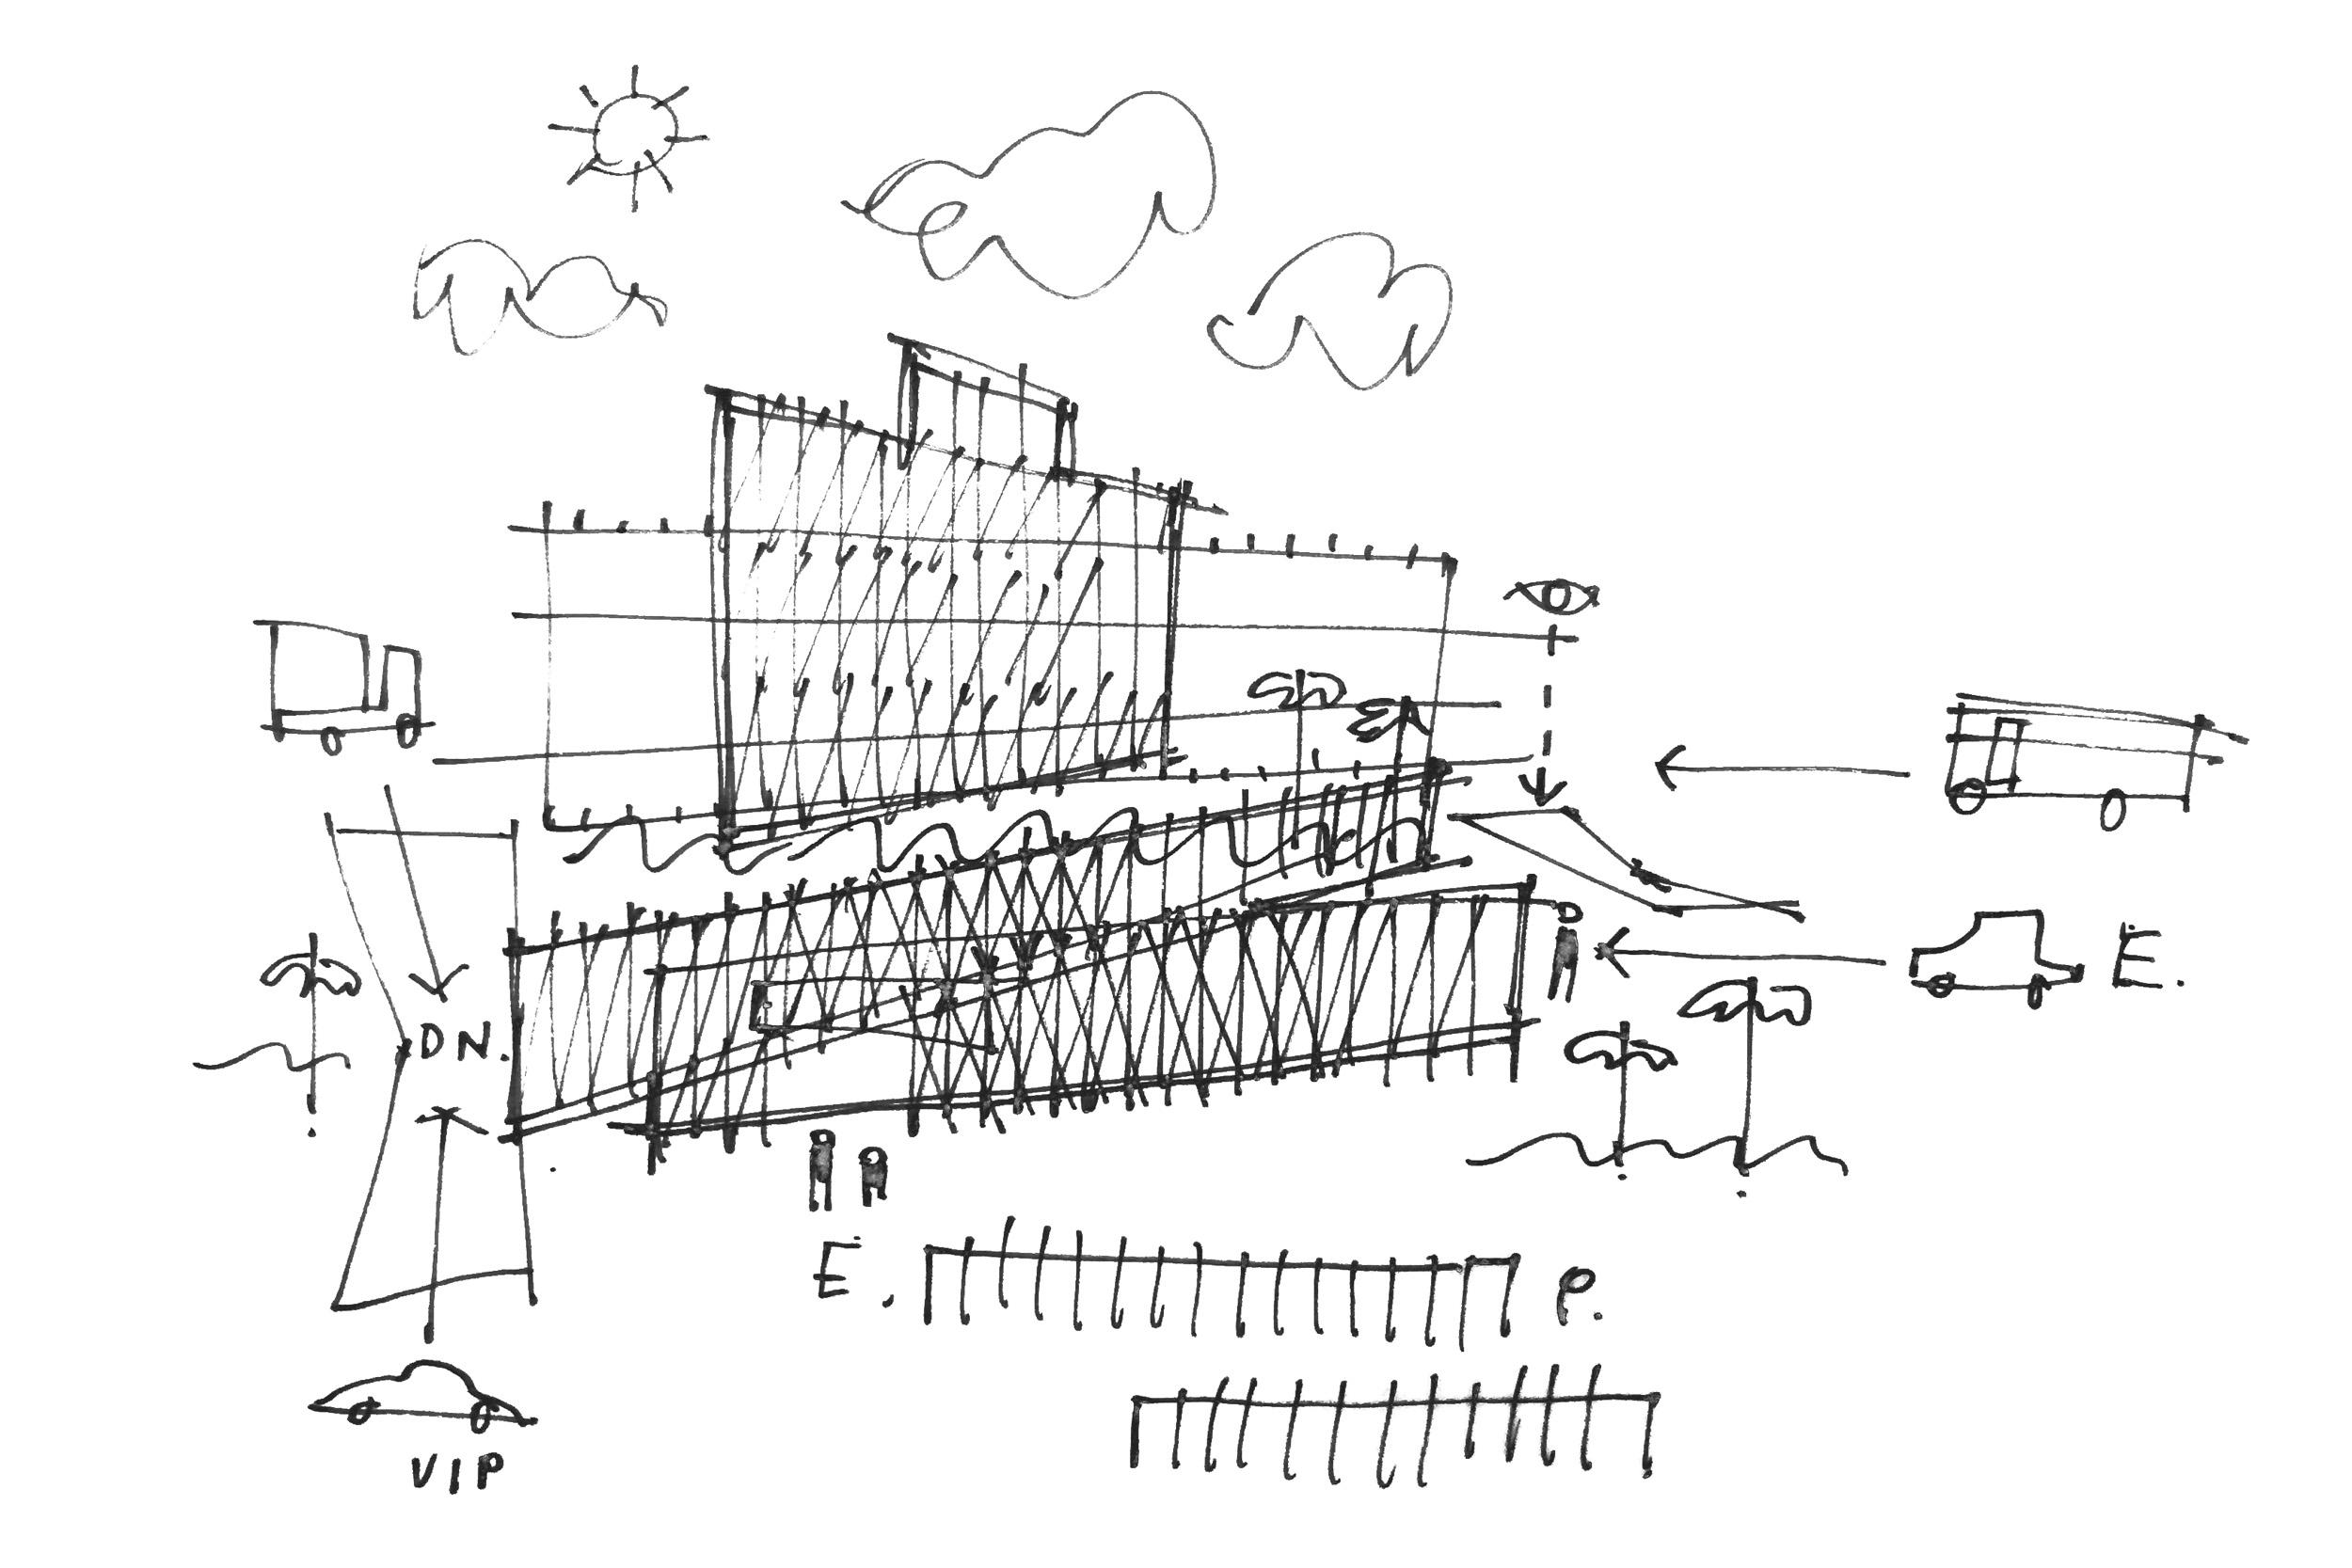 PCH-Concept-Sketch.jpg